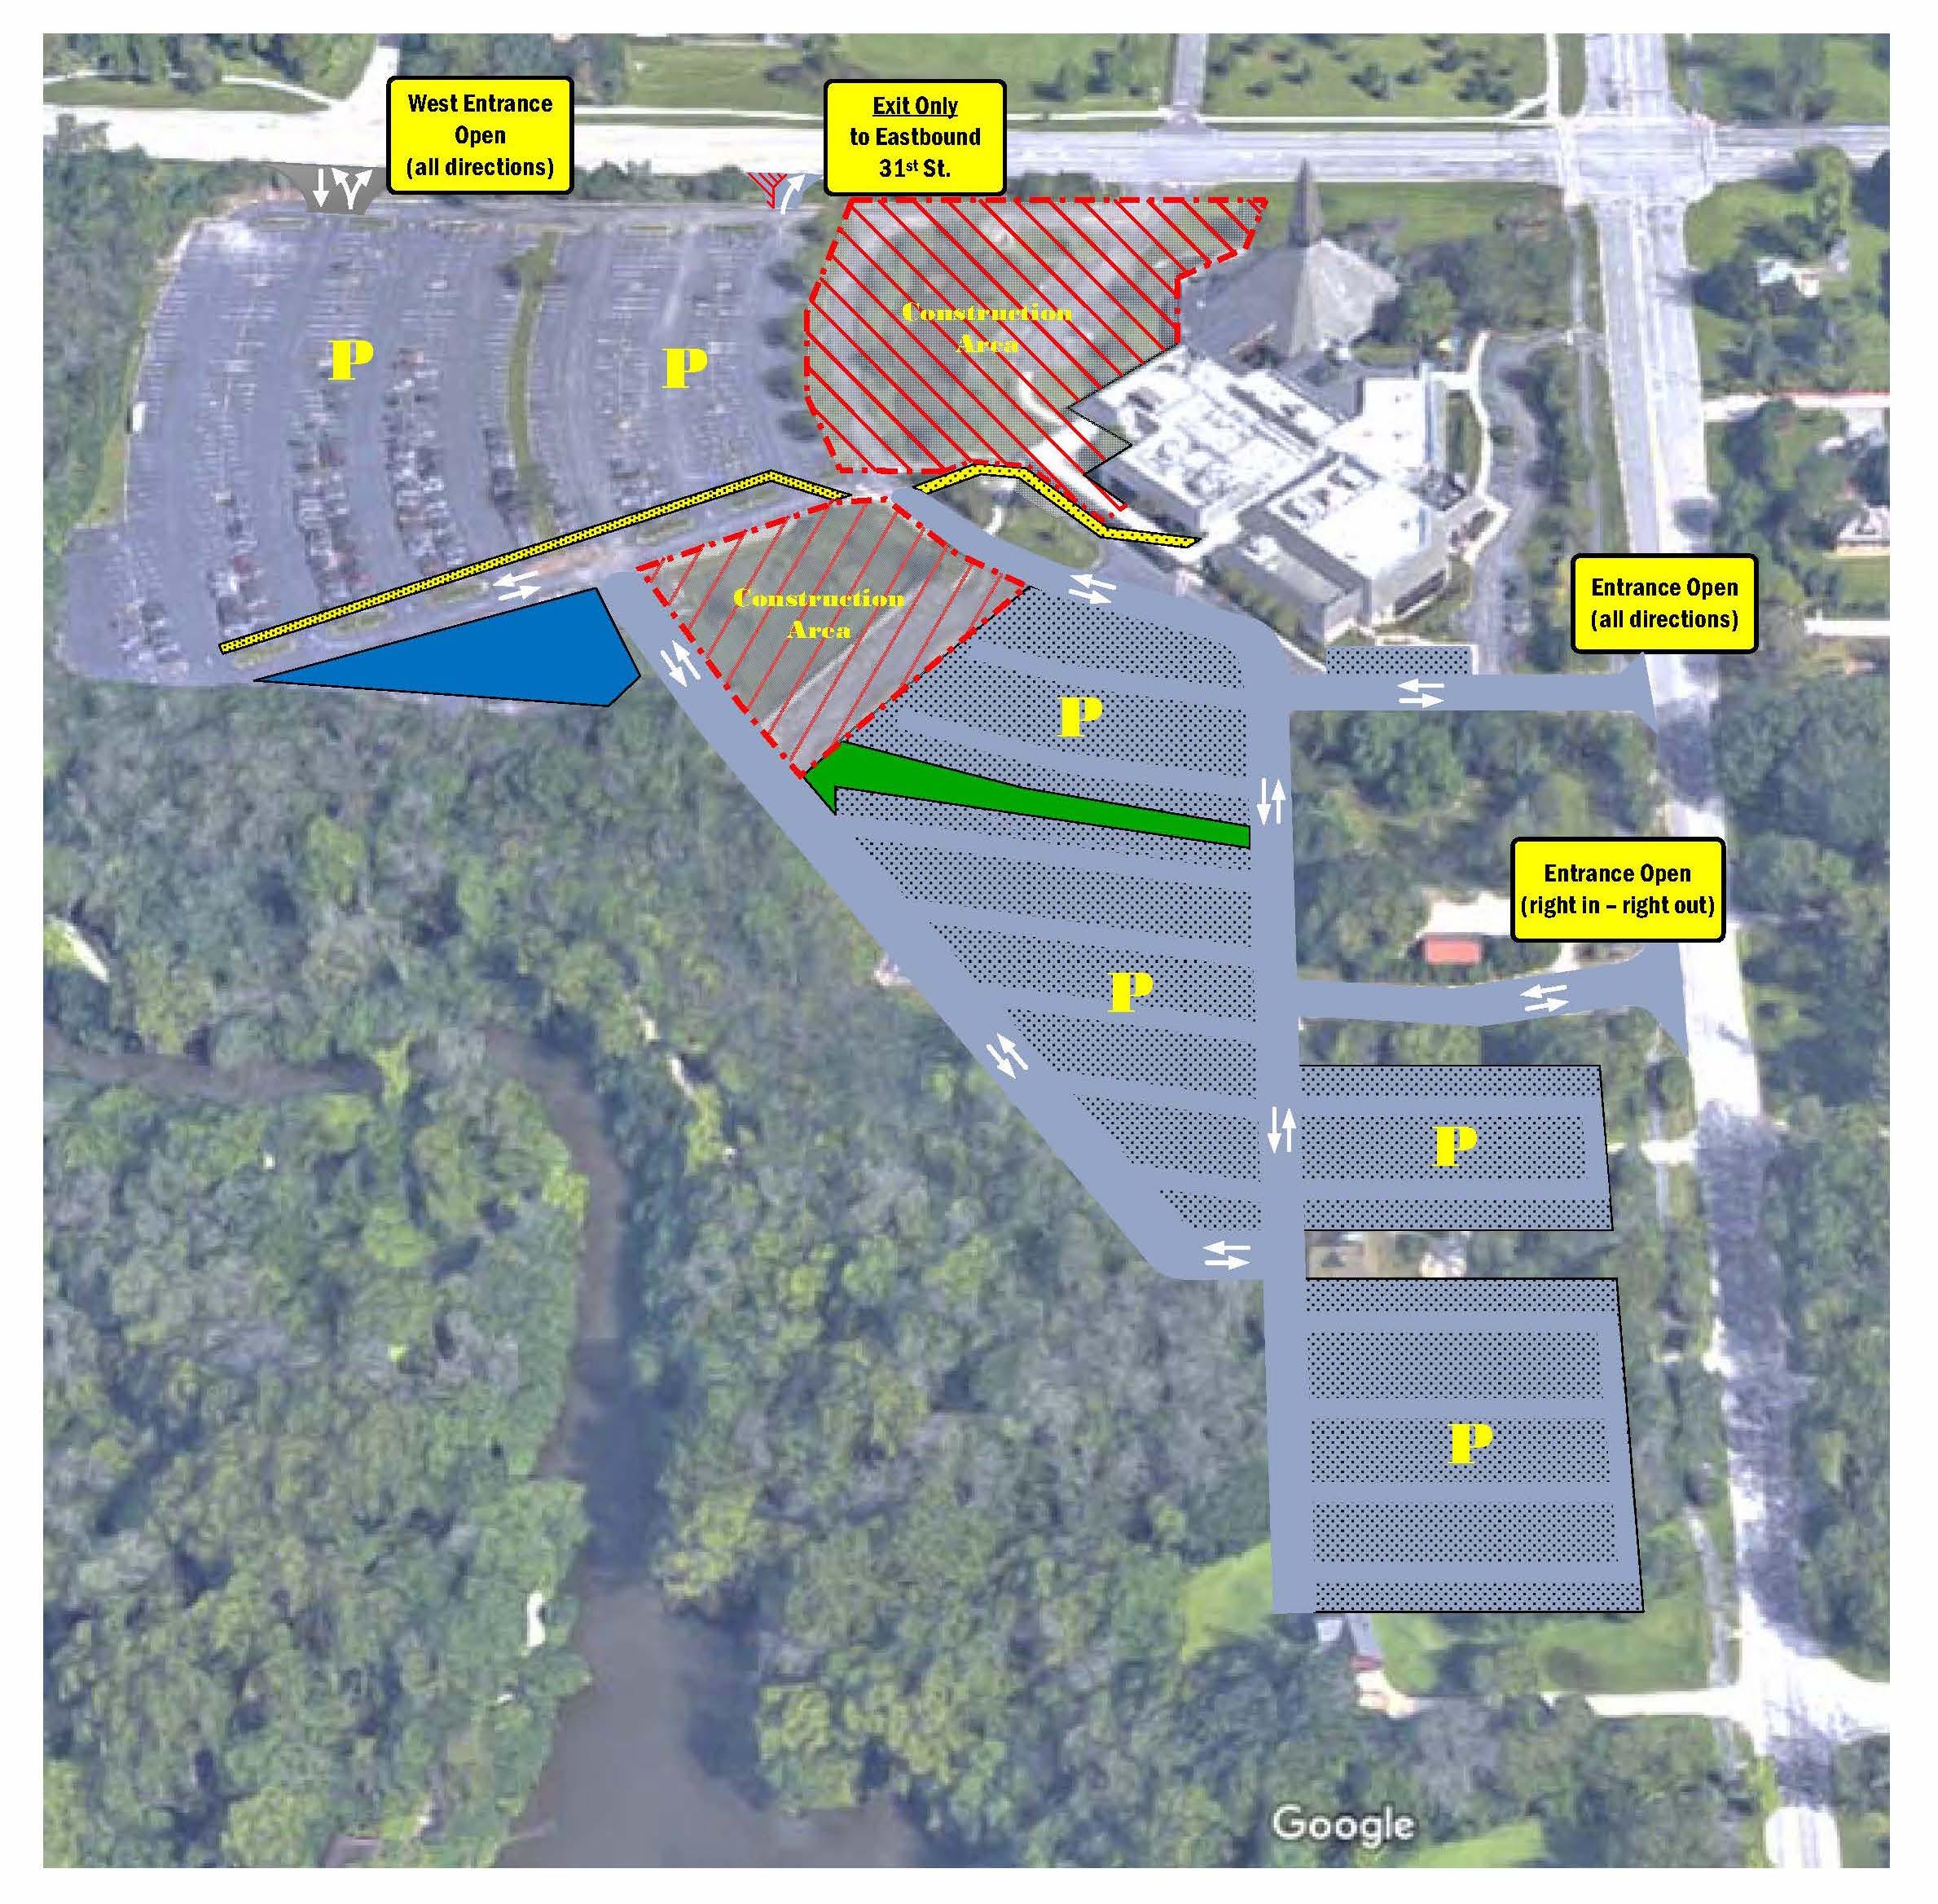 Constr - Lot Plan 2017-10-03a.jpg